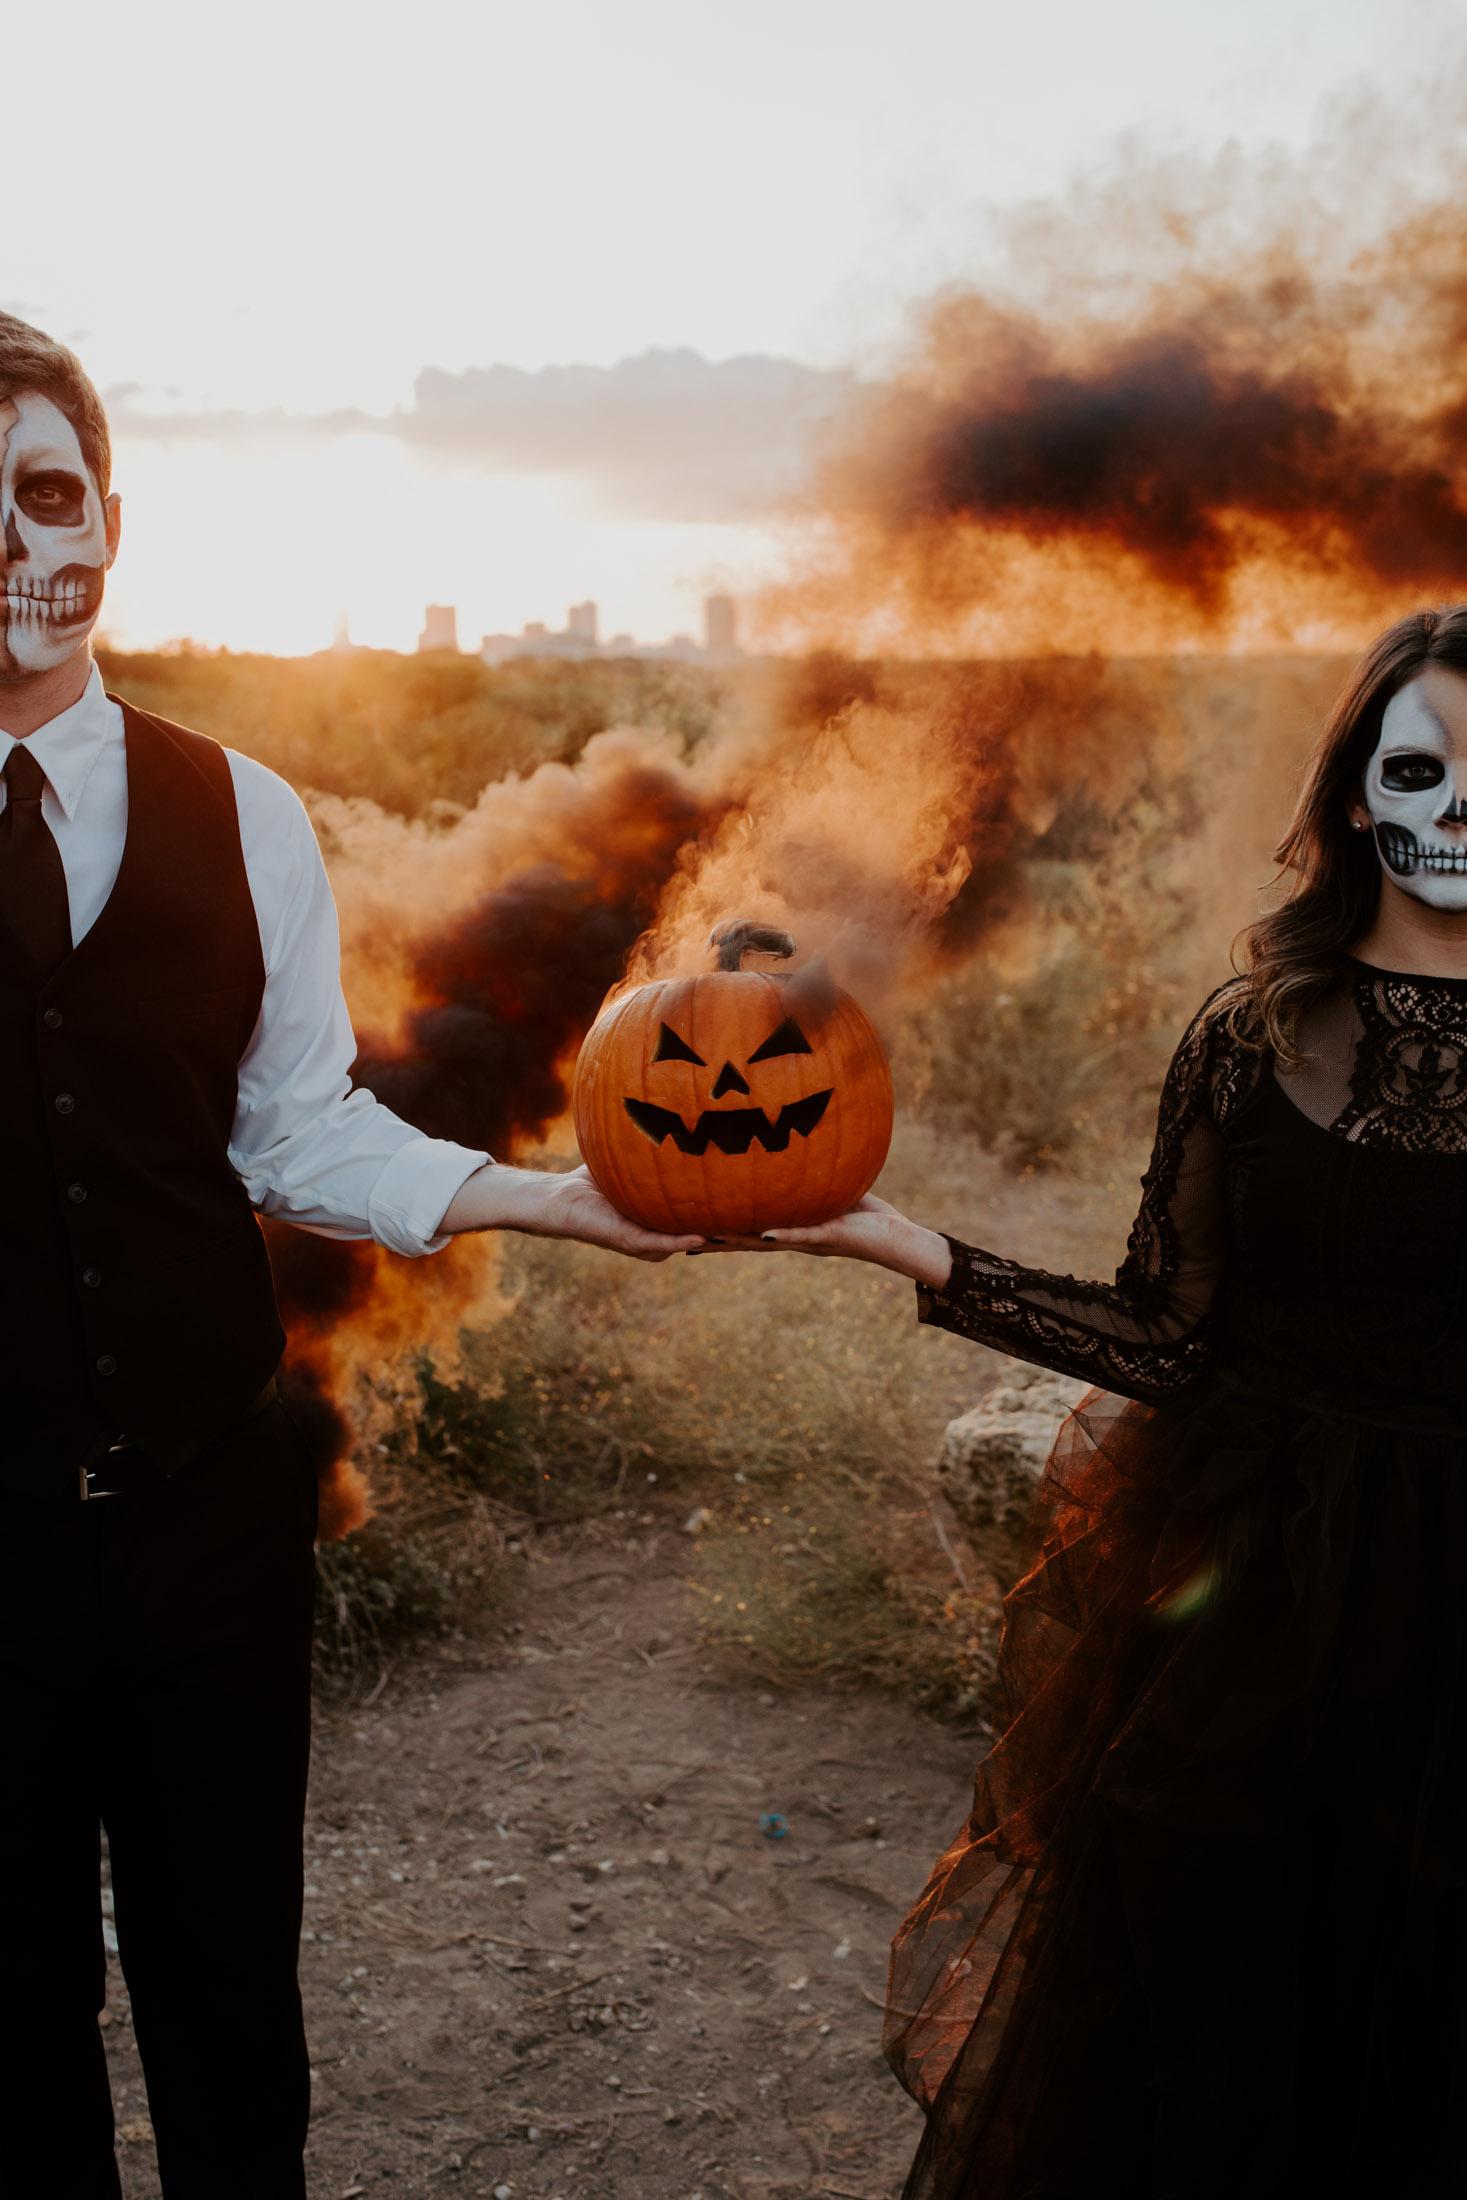 couple wearing skeleton makeup holding a jack-o-lantern with a smoke bomb inside